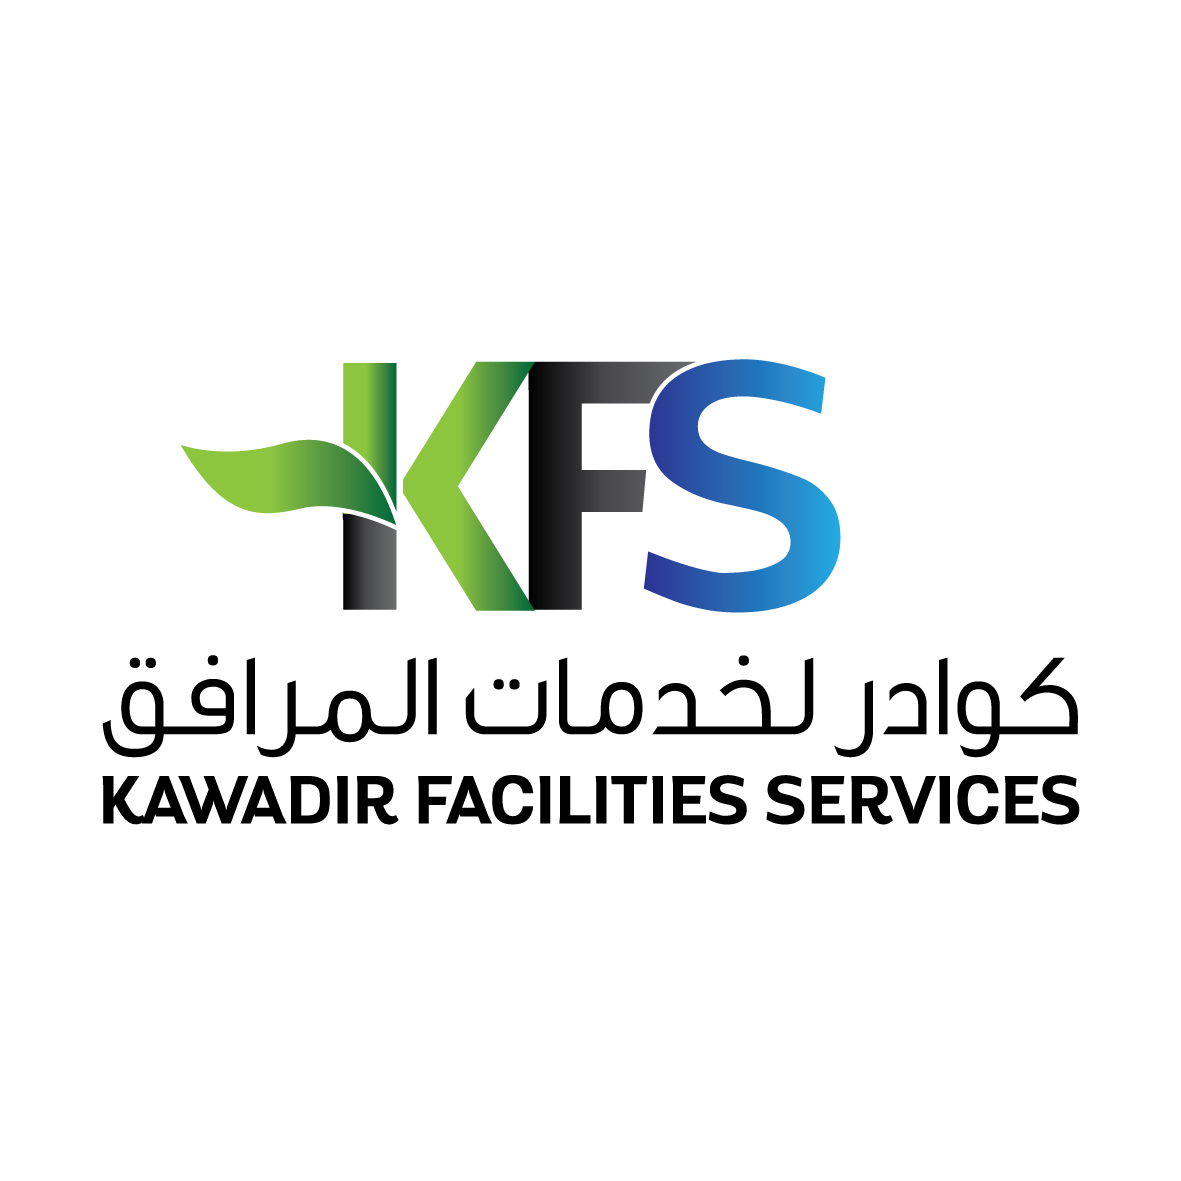 Kawadir Facilities Services